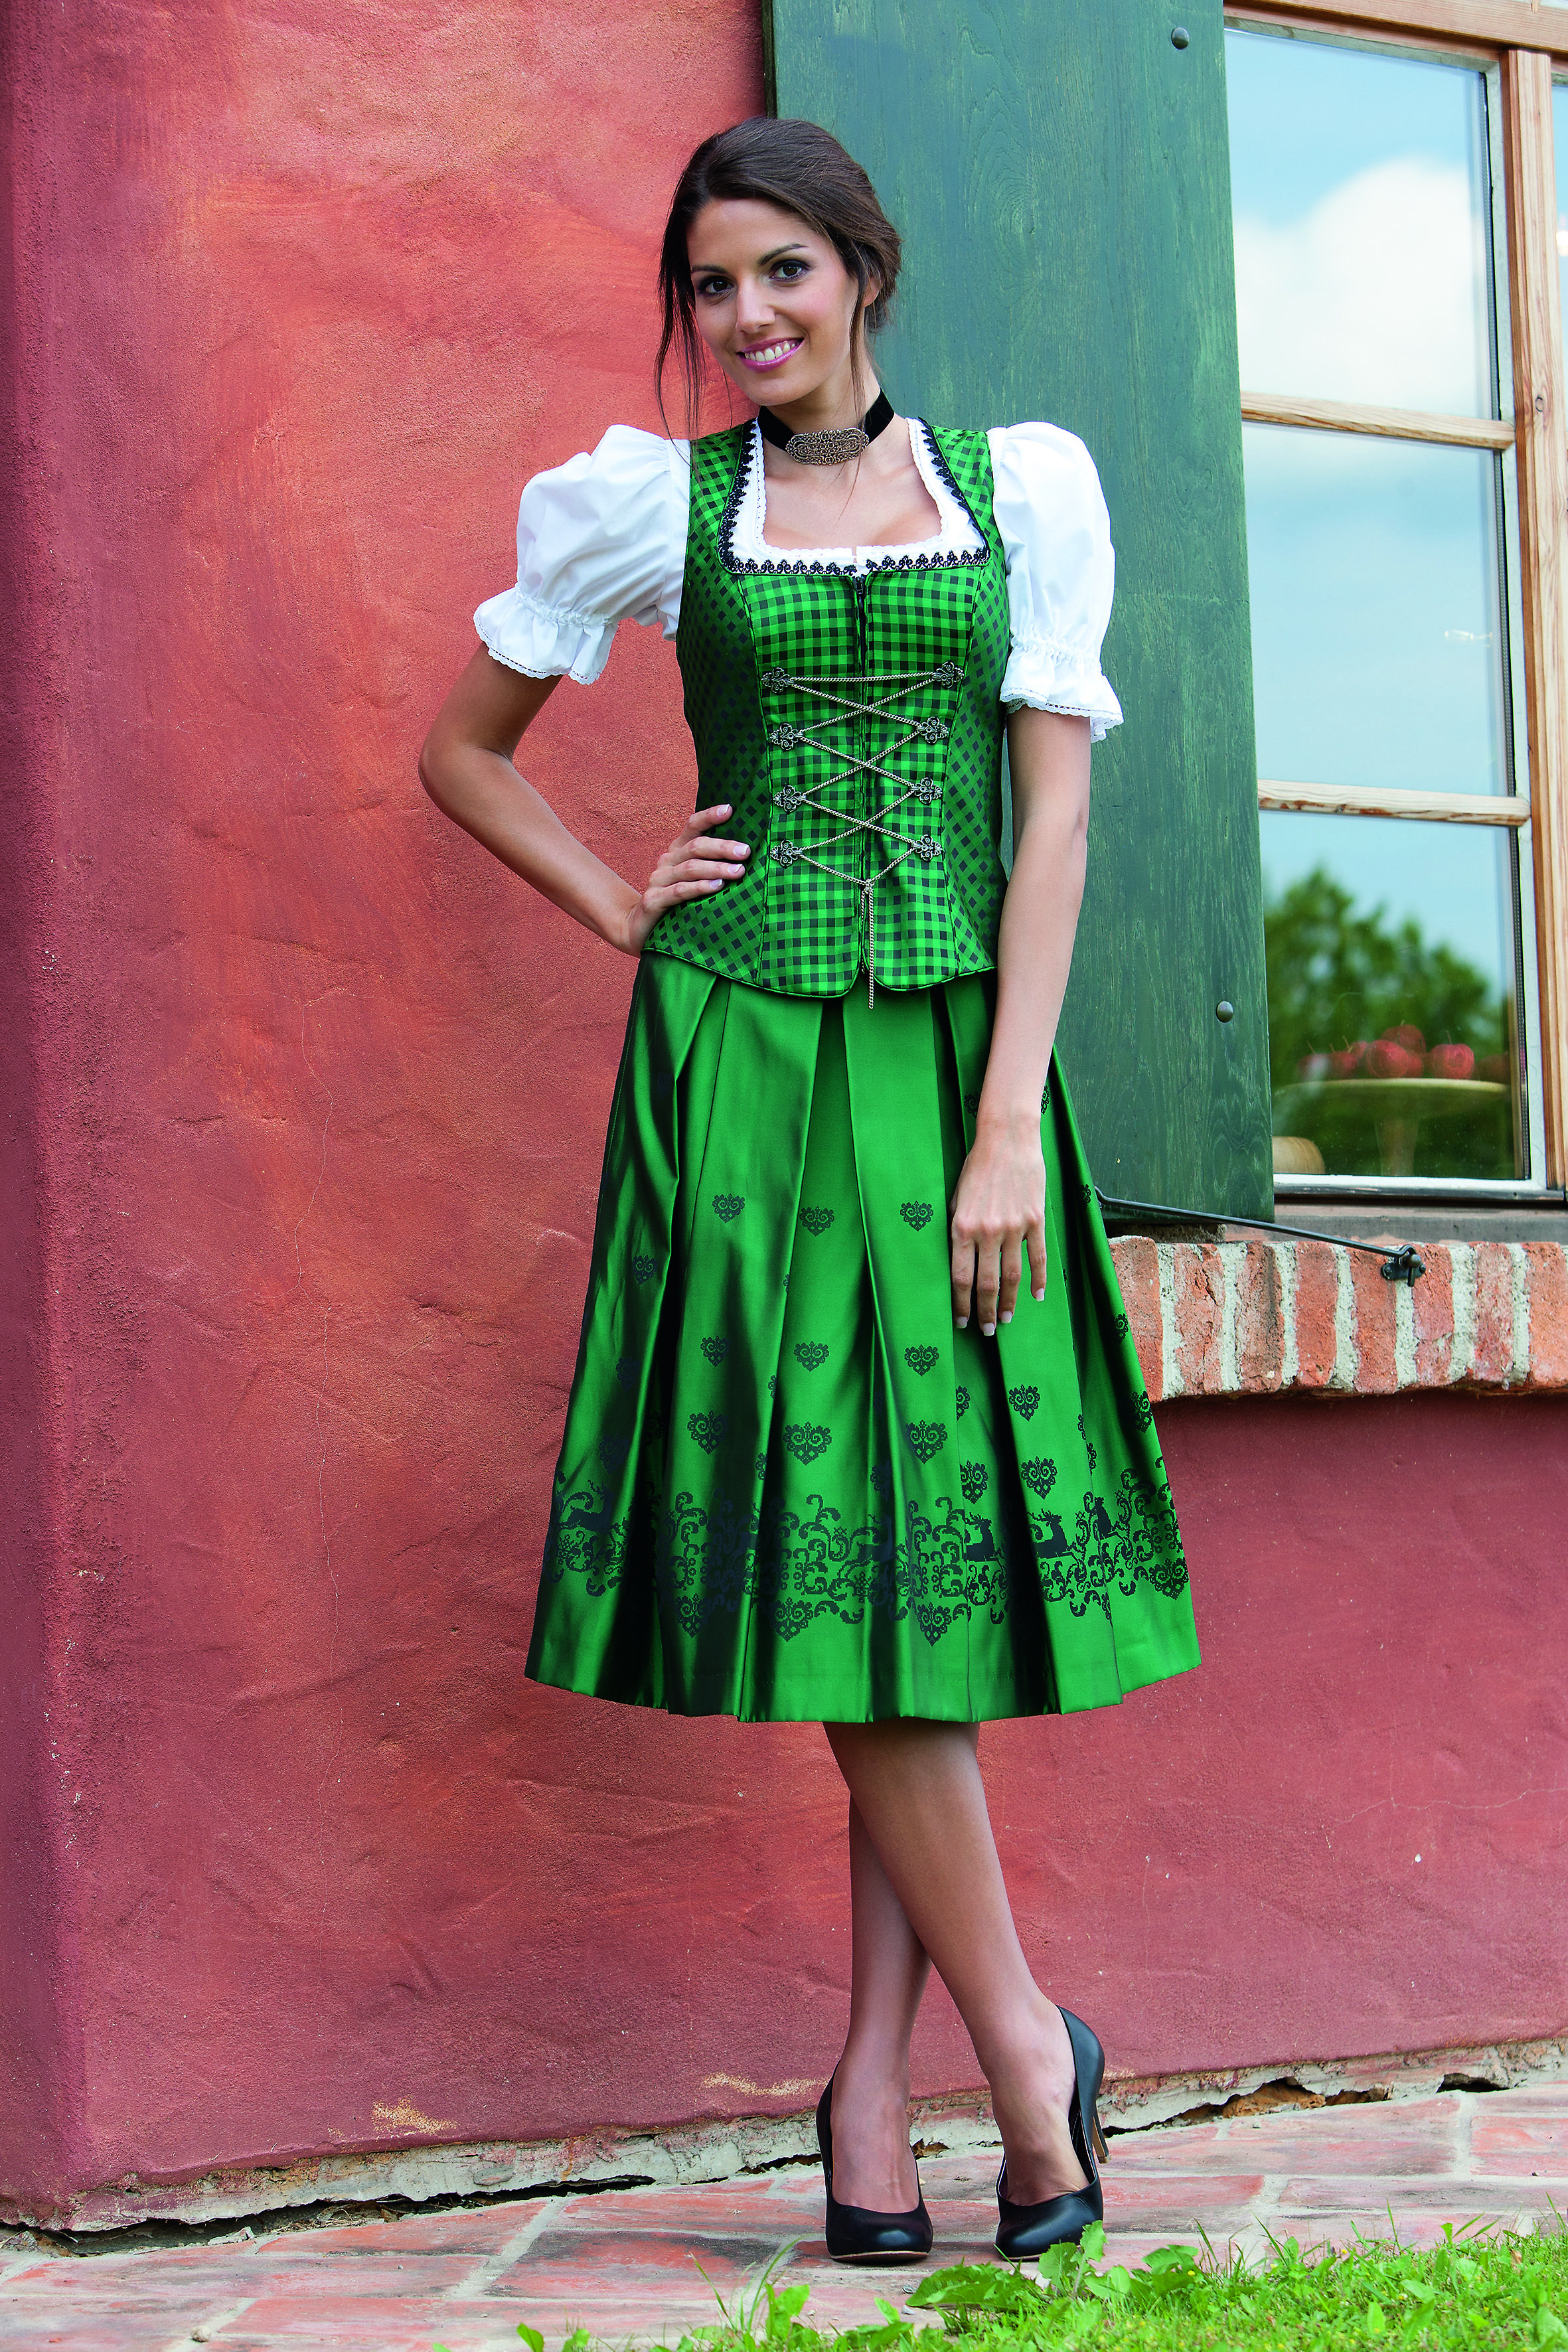 Awesome Gestbaum Skirt Muster Motif - Decke Stricken Muster ...